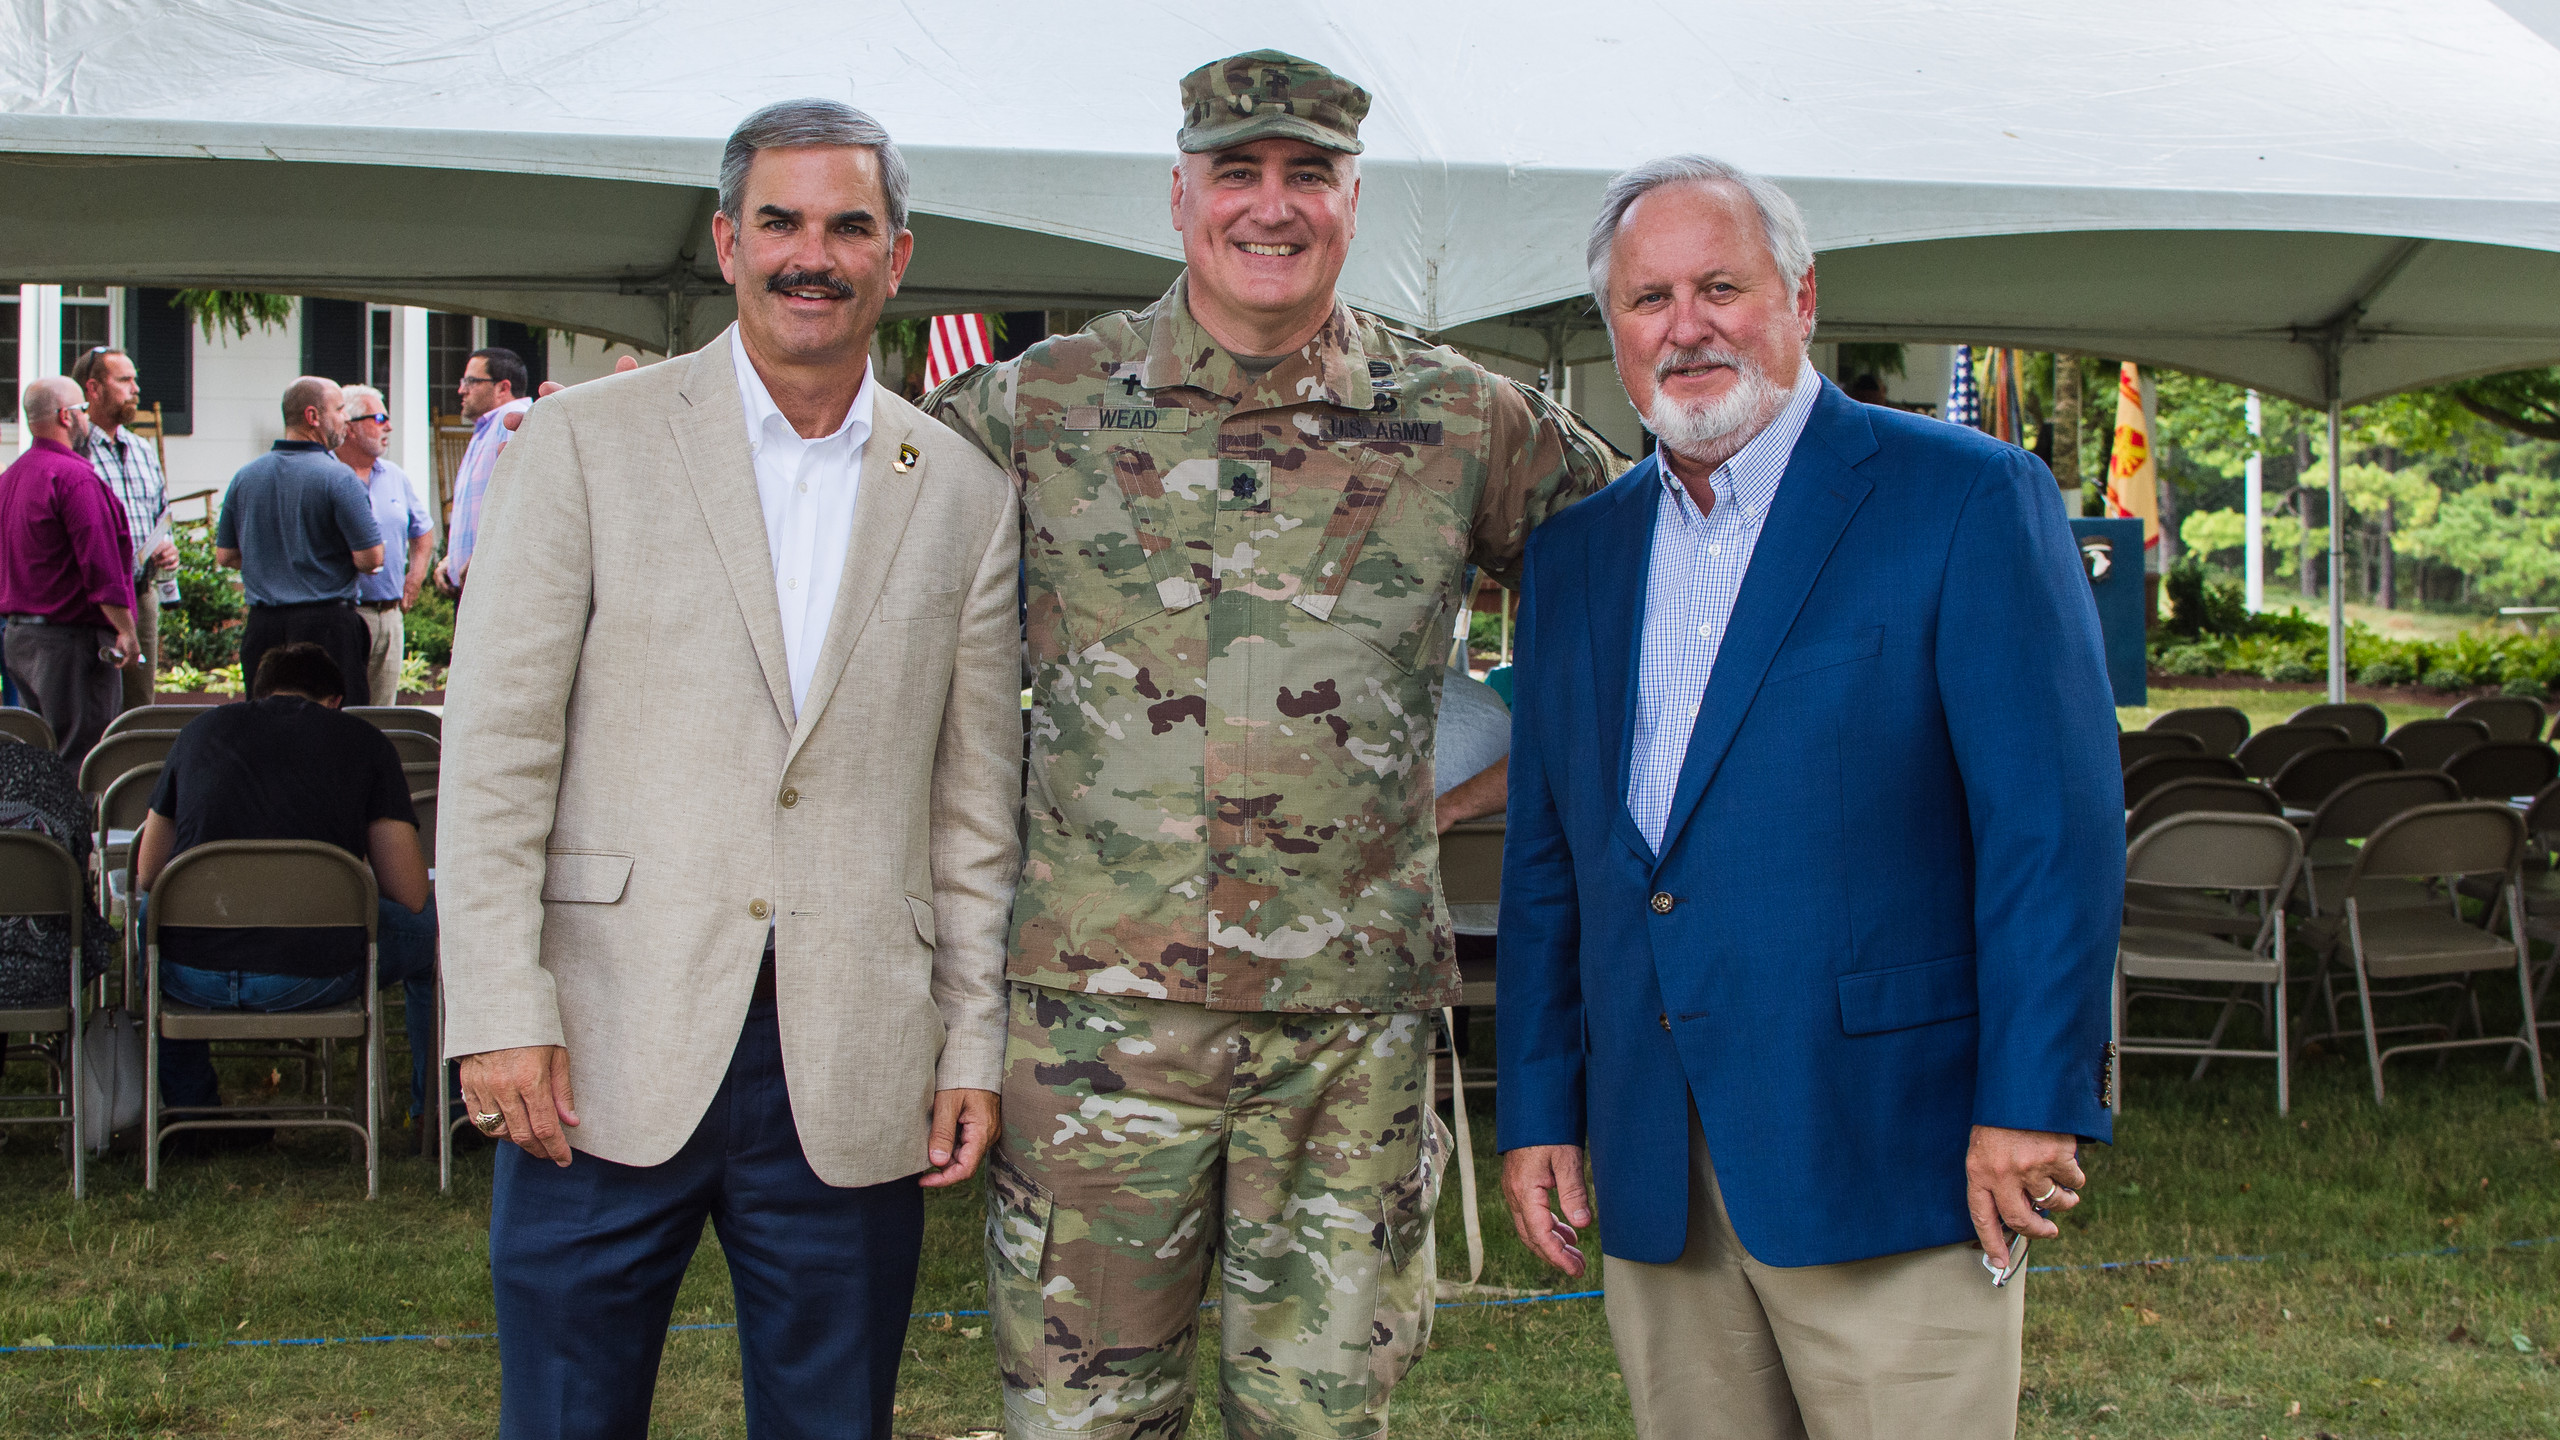 Charlie Koon, Lt Col Wead, and Sammy Stu